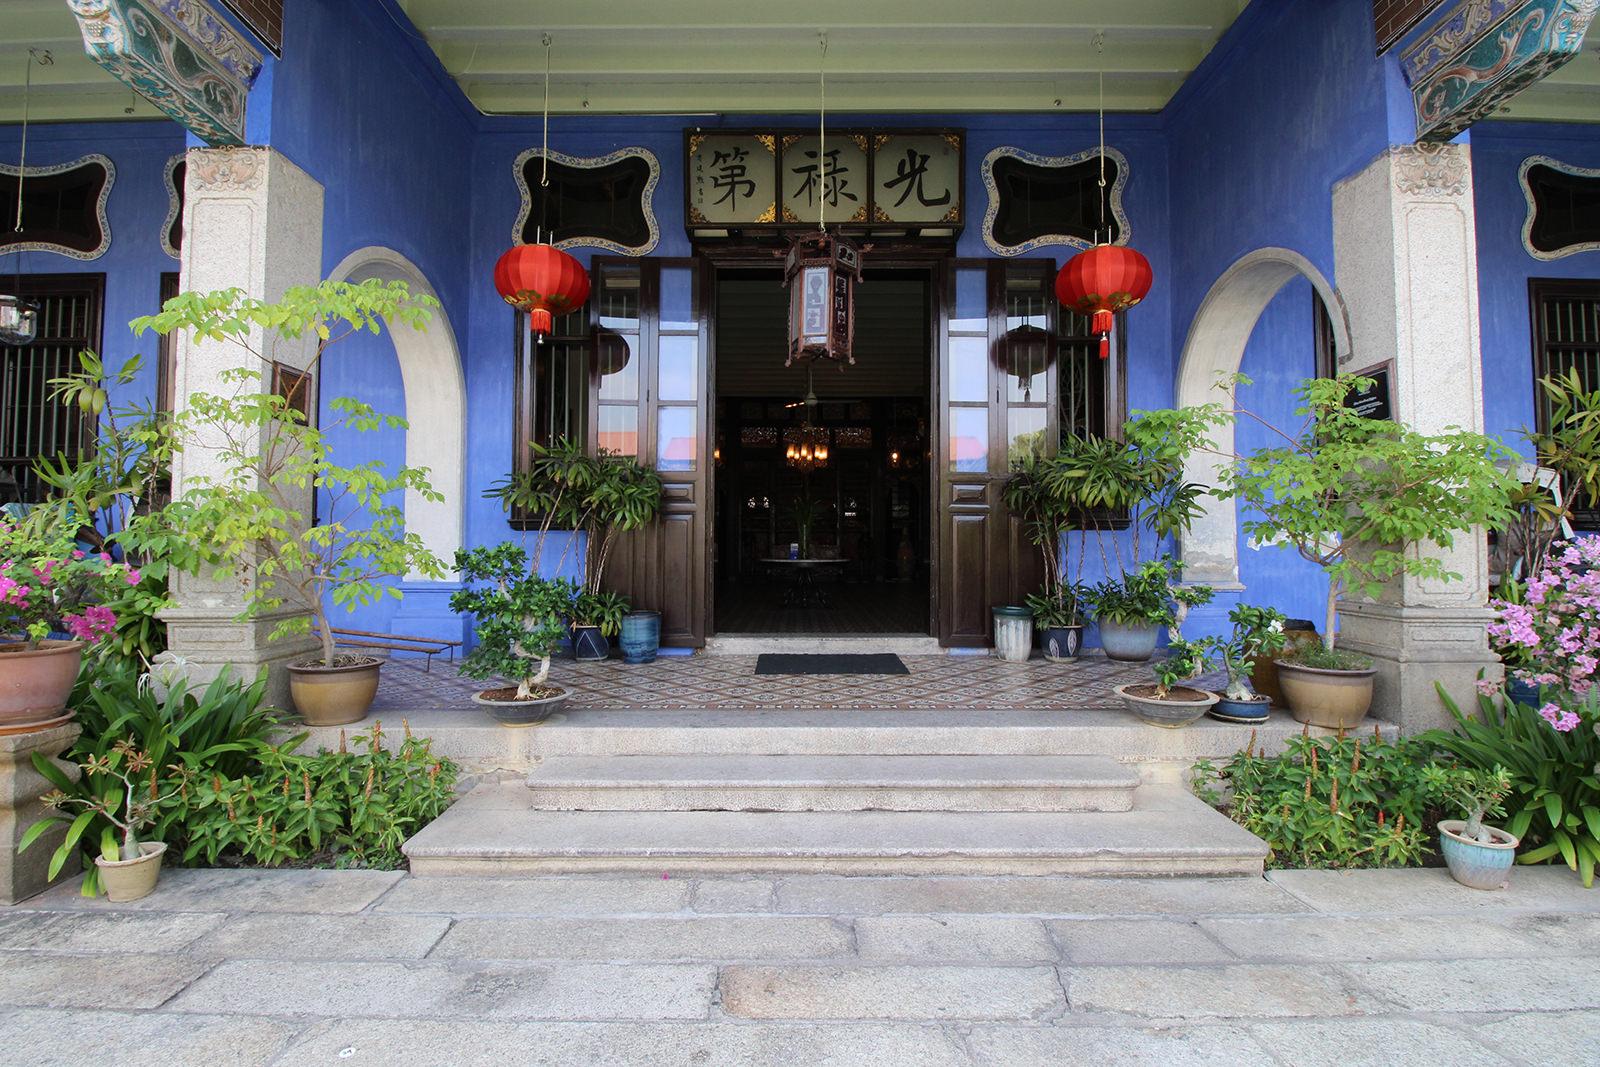 boutique-hotel-penang-island-blue-mansion-architecture-05-1 Architecture